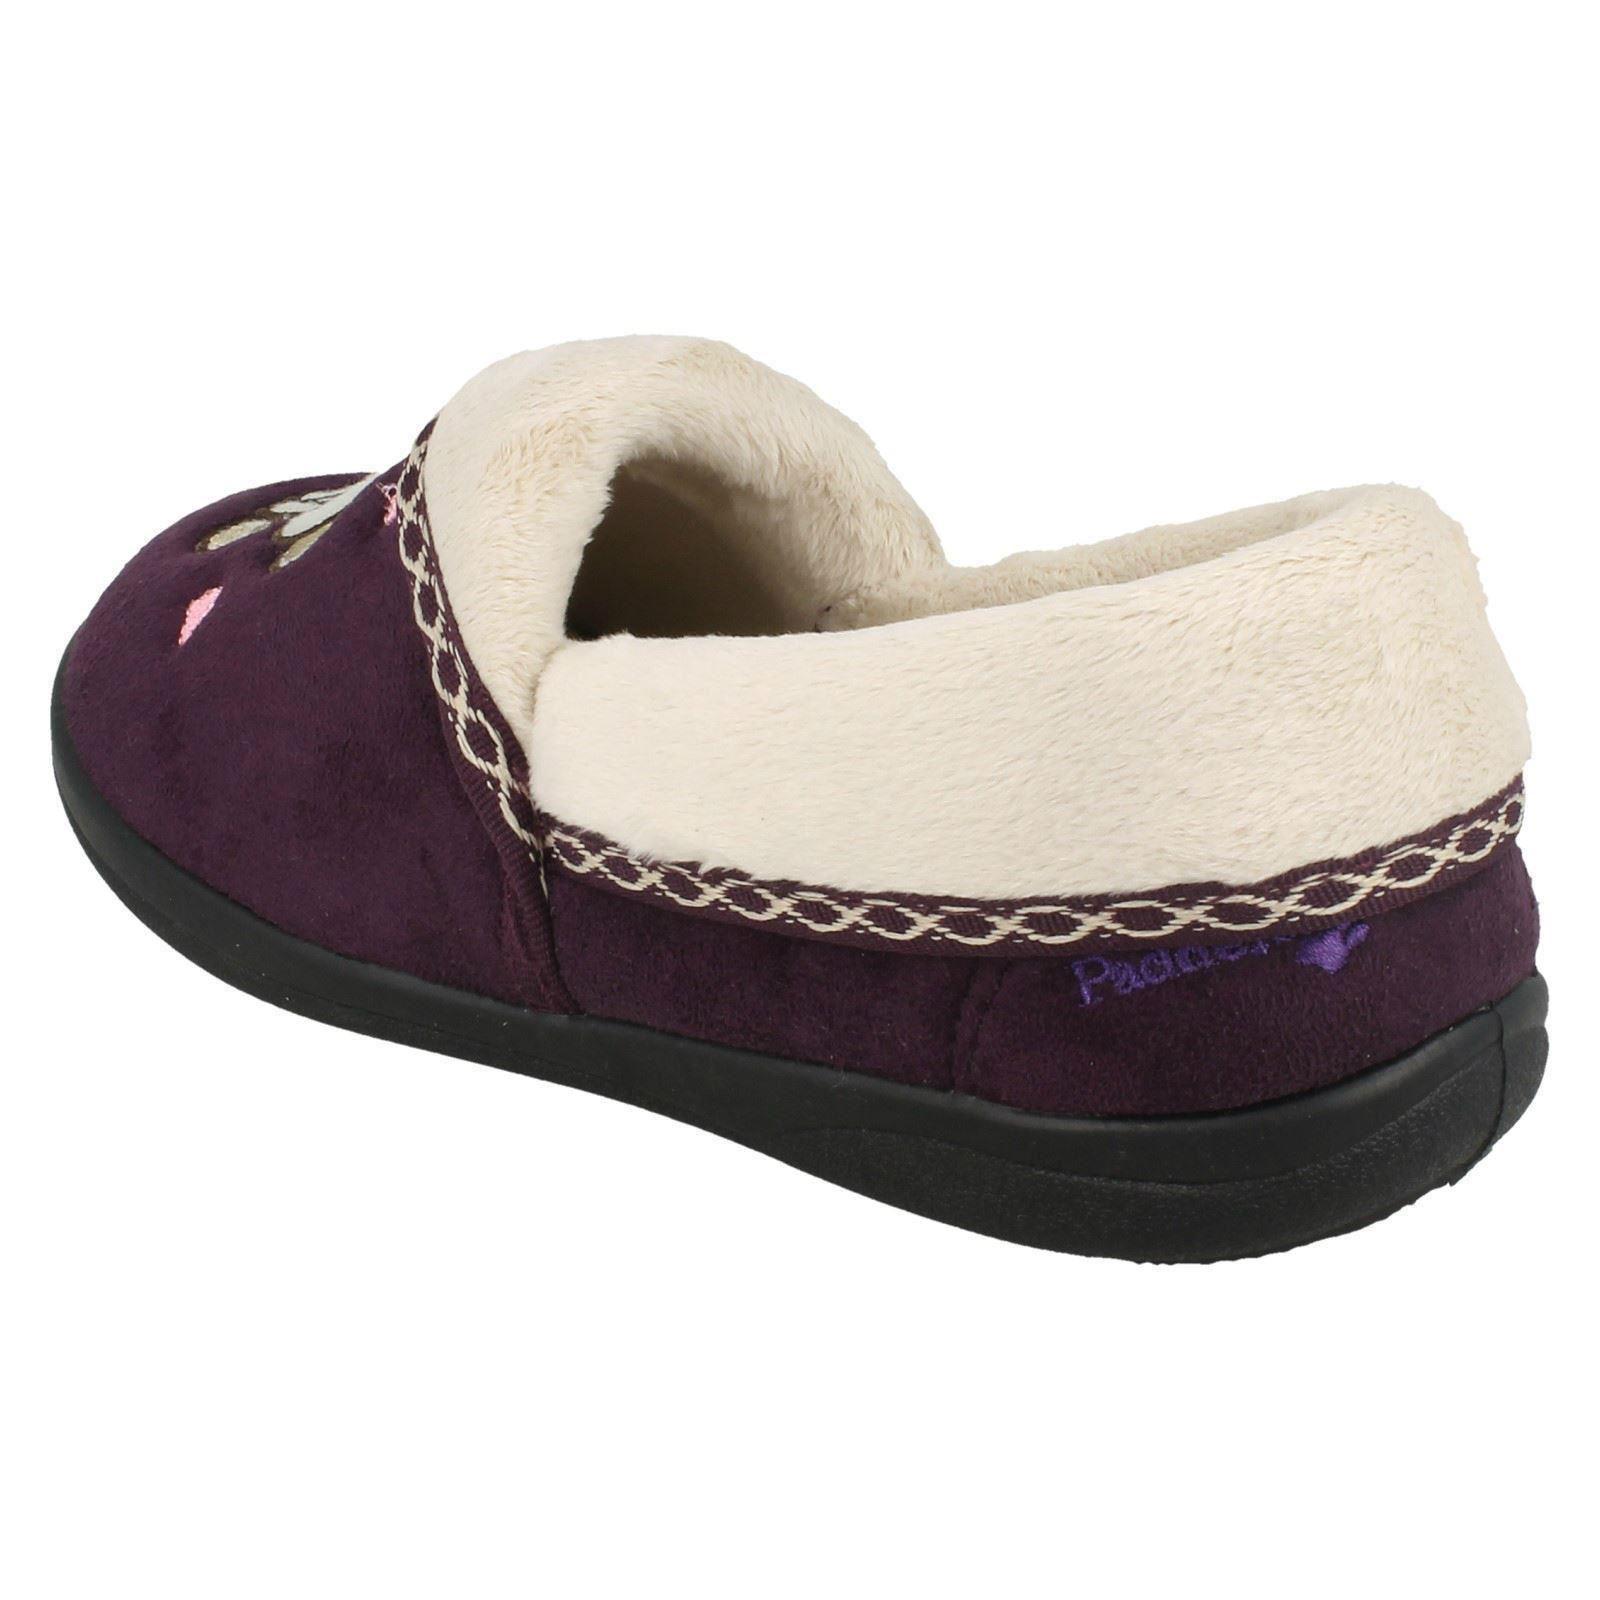 Padders Purple House Ladies Teddy Slippers 7vyqyZd